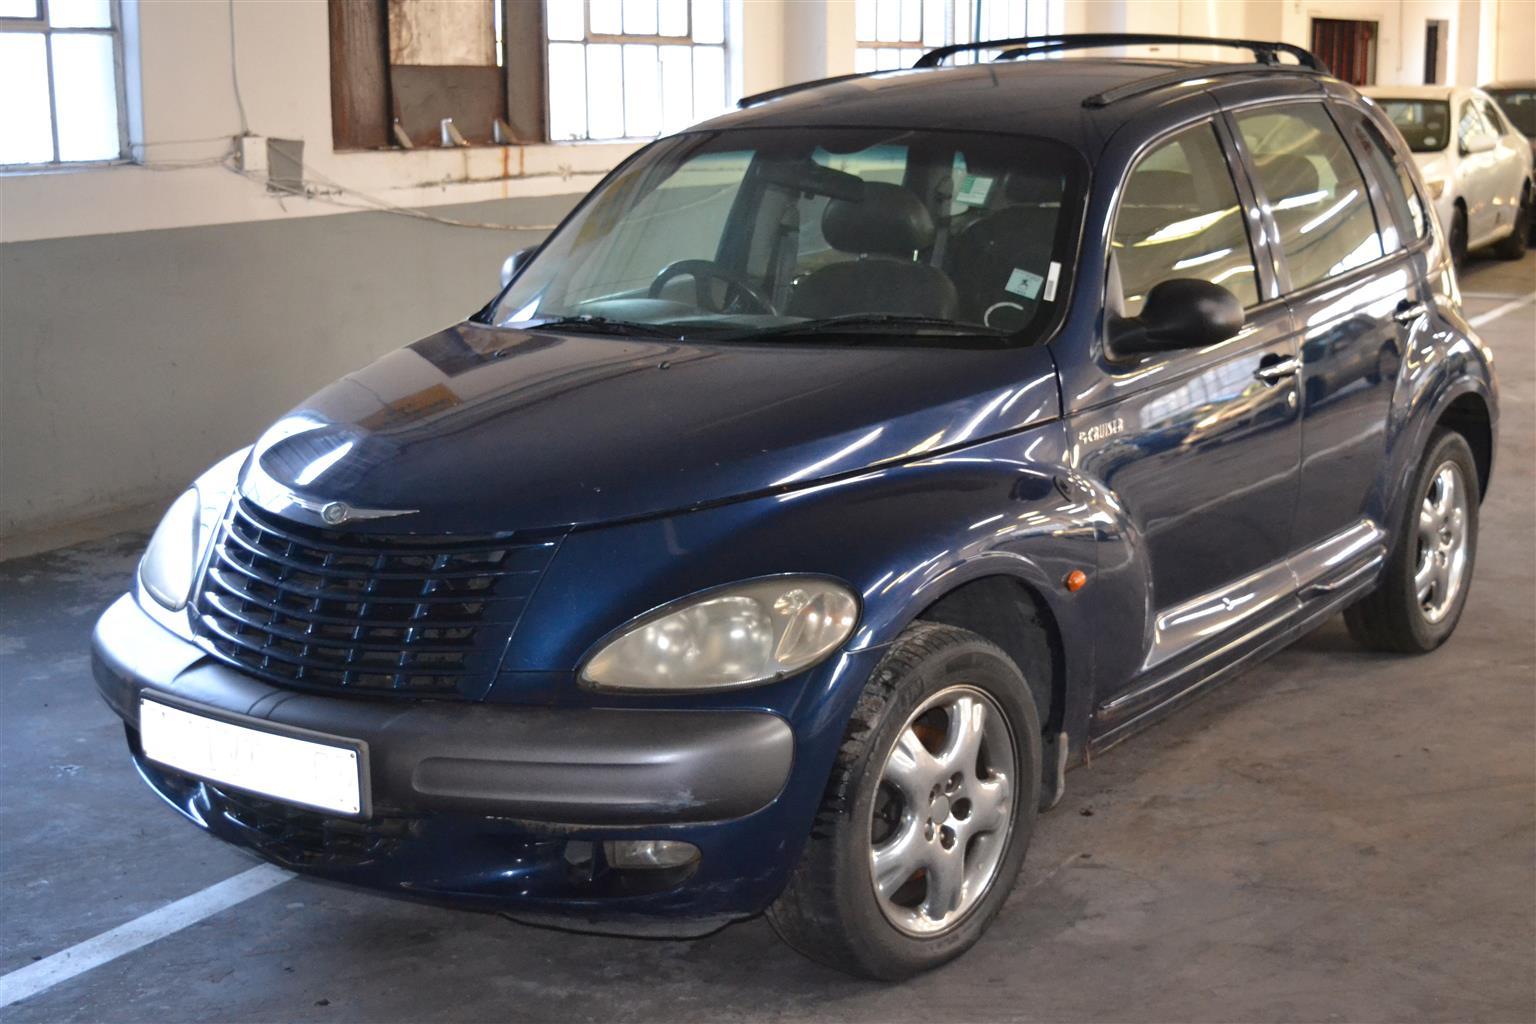 2000 Chrysler PT Cruiser 2.2CRD Classic